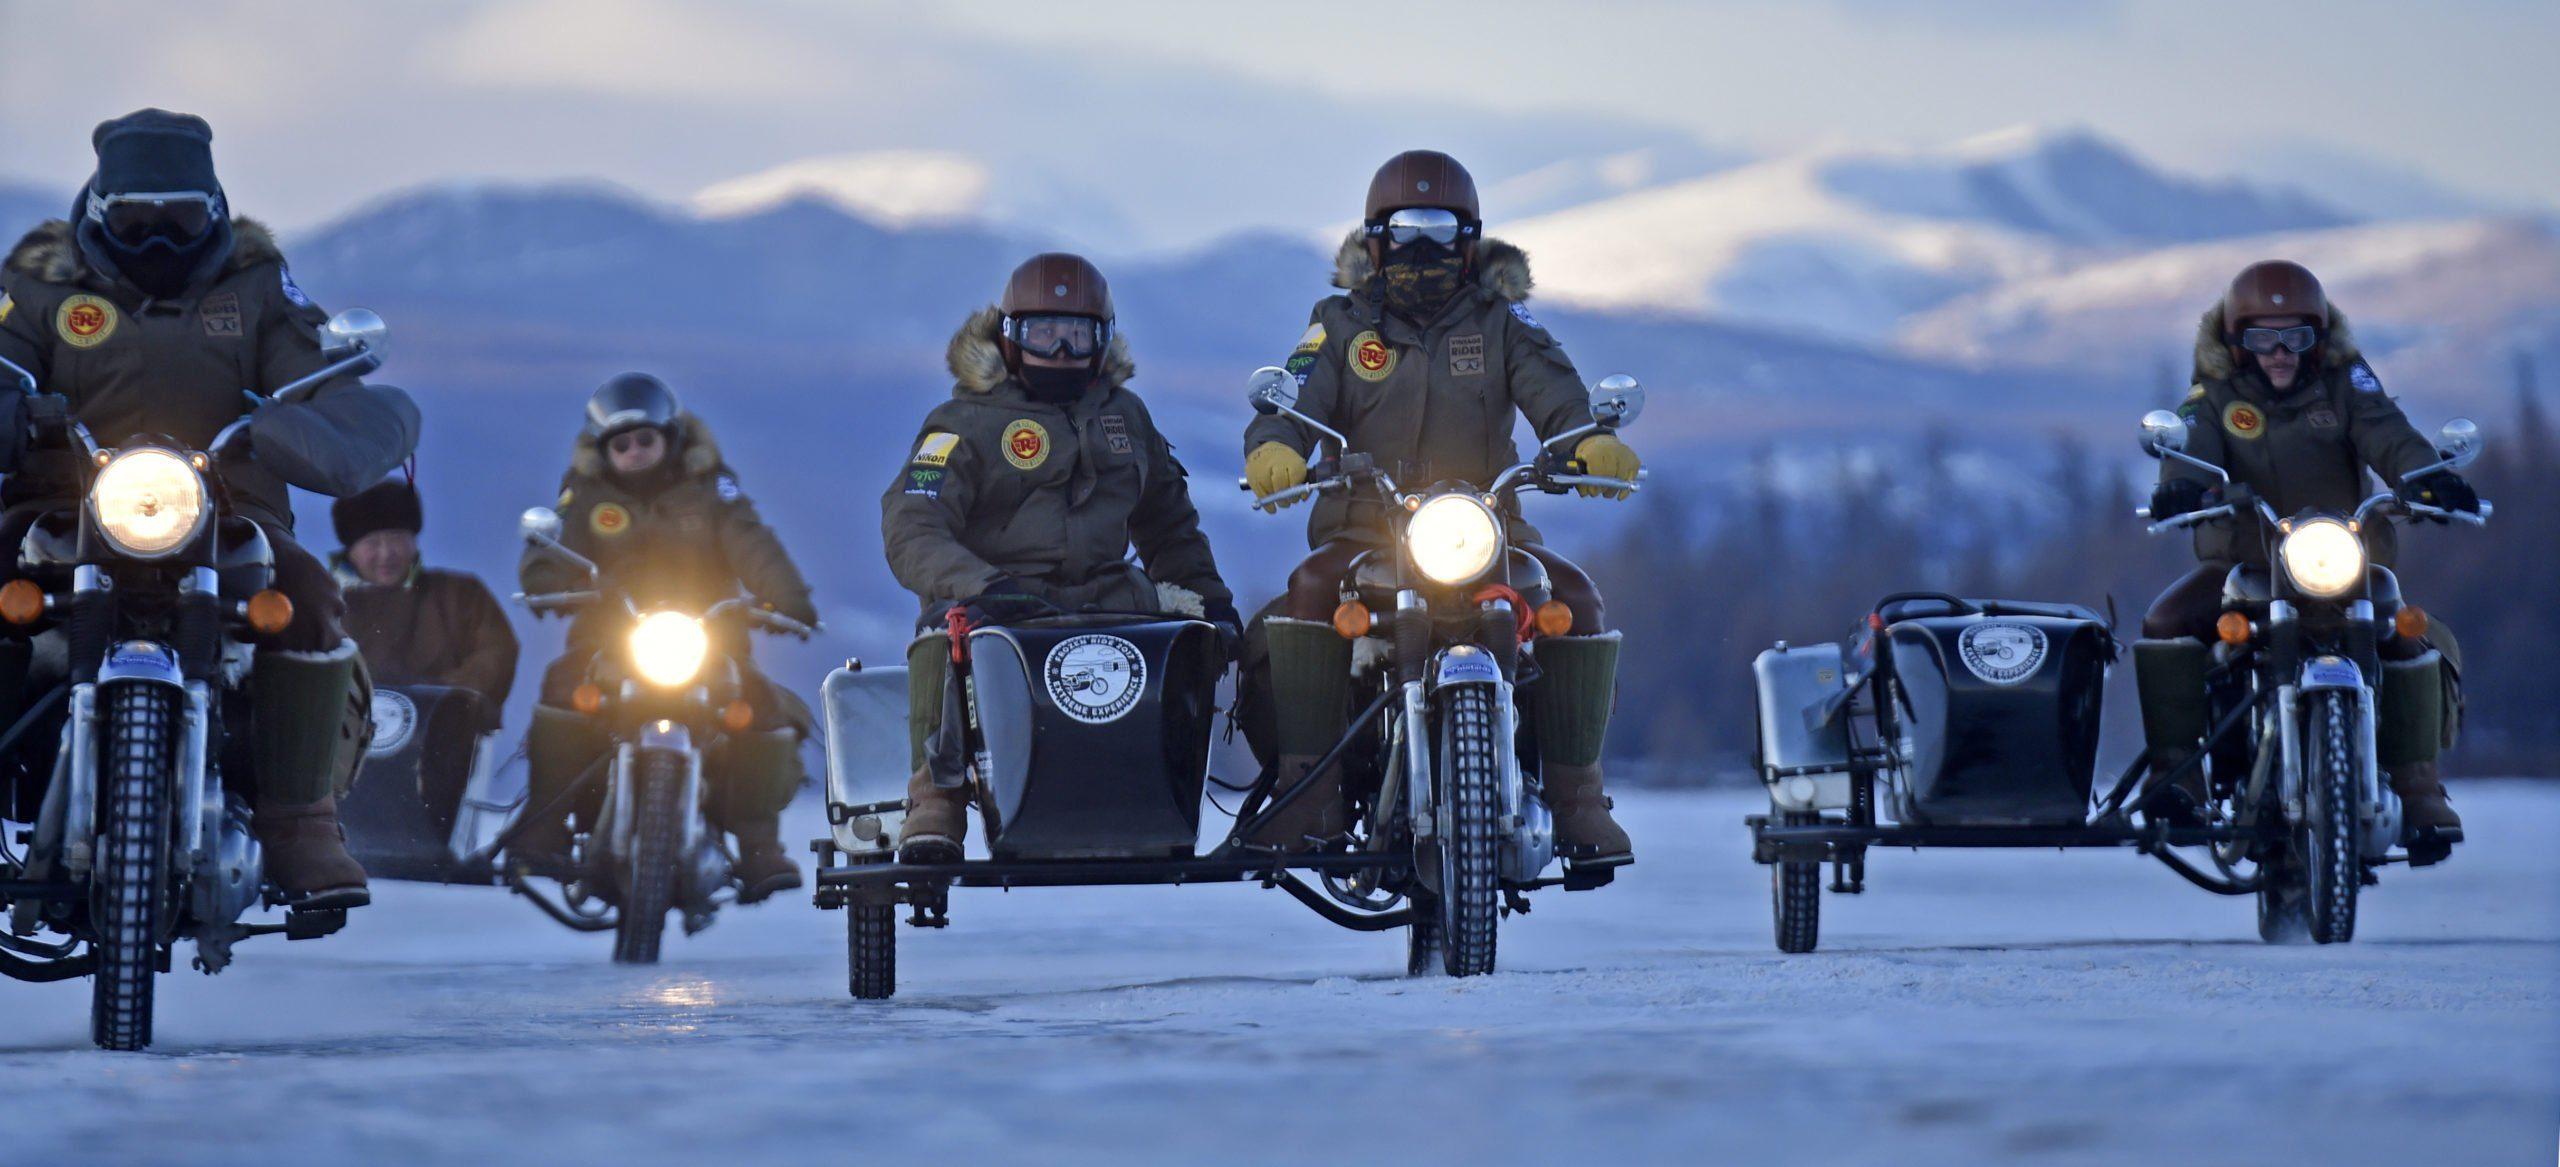 rider group mongolia